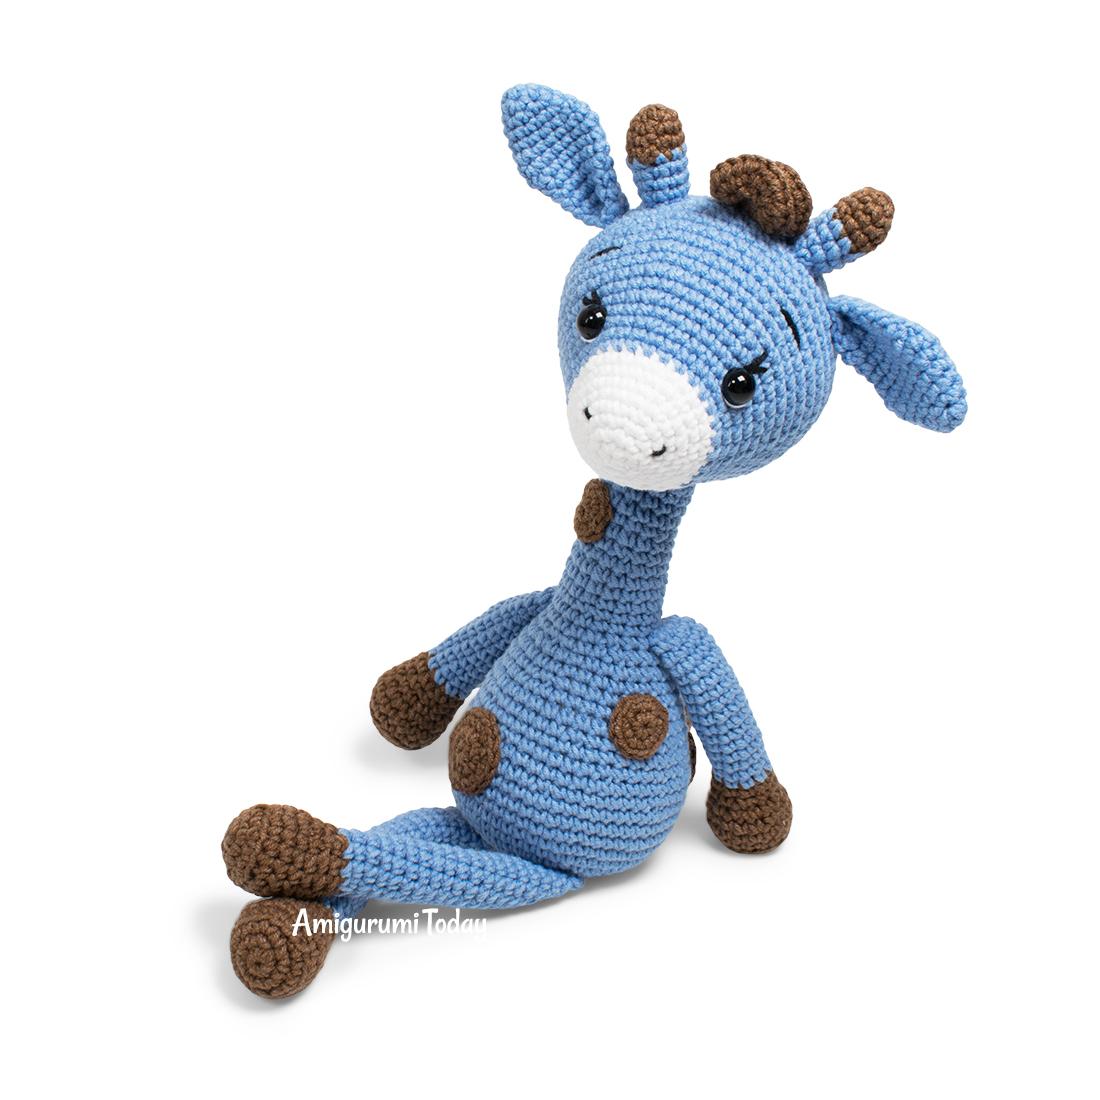 Free crochet owl amigurumi pattern - Amigurumi Today | 1100x1100